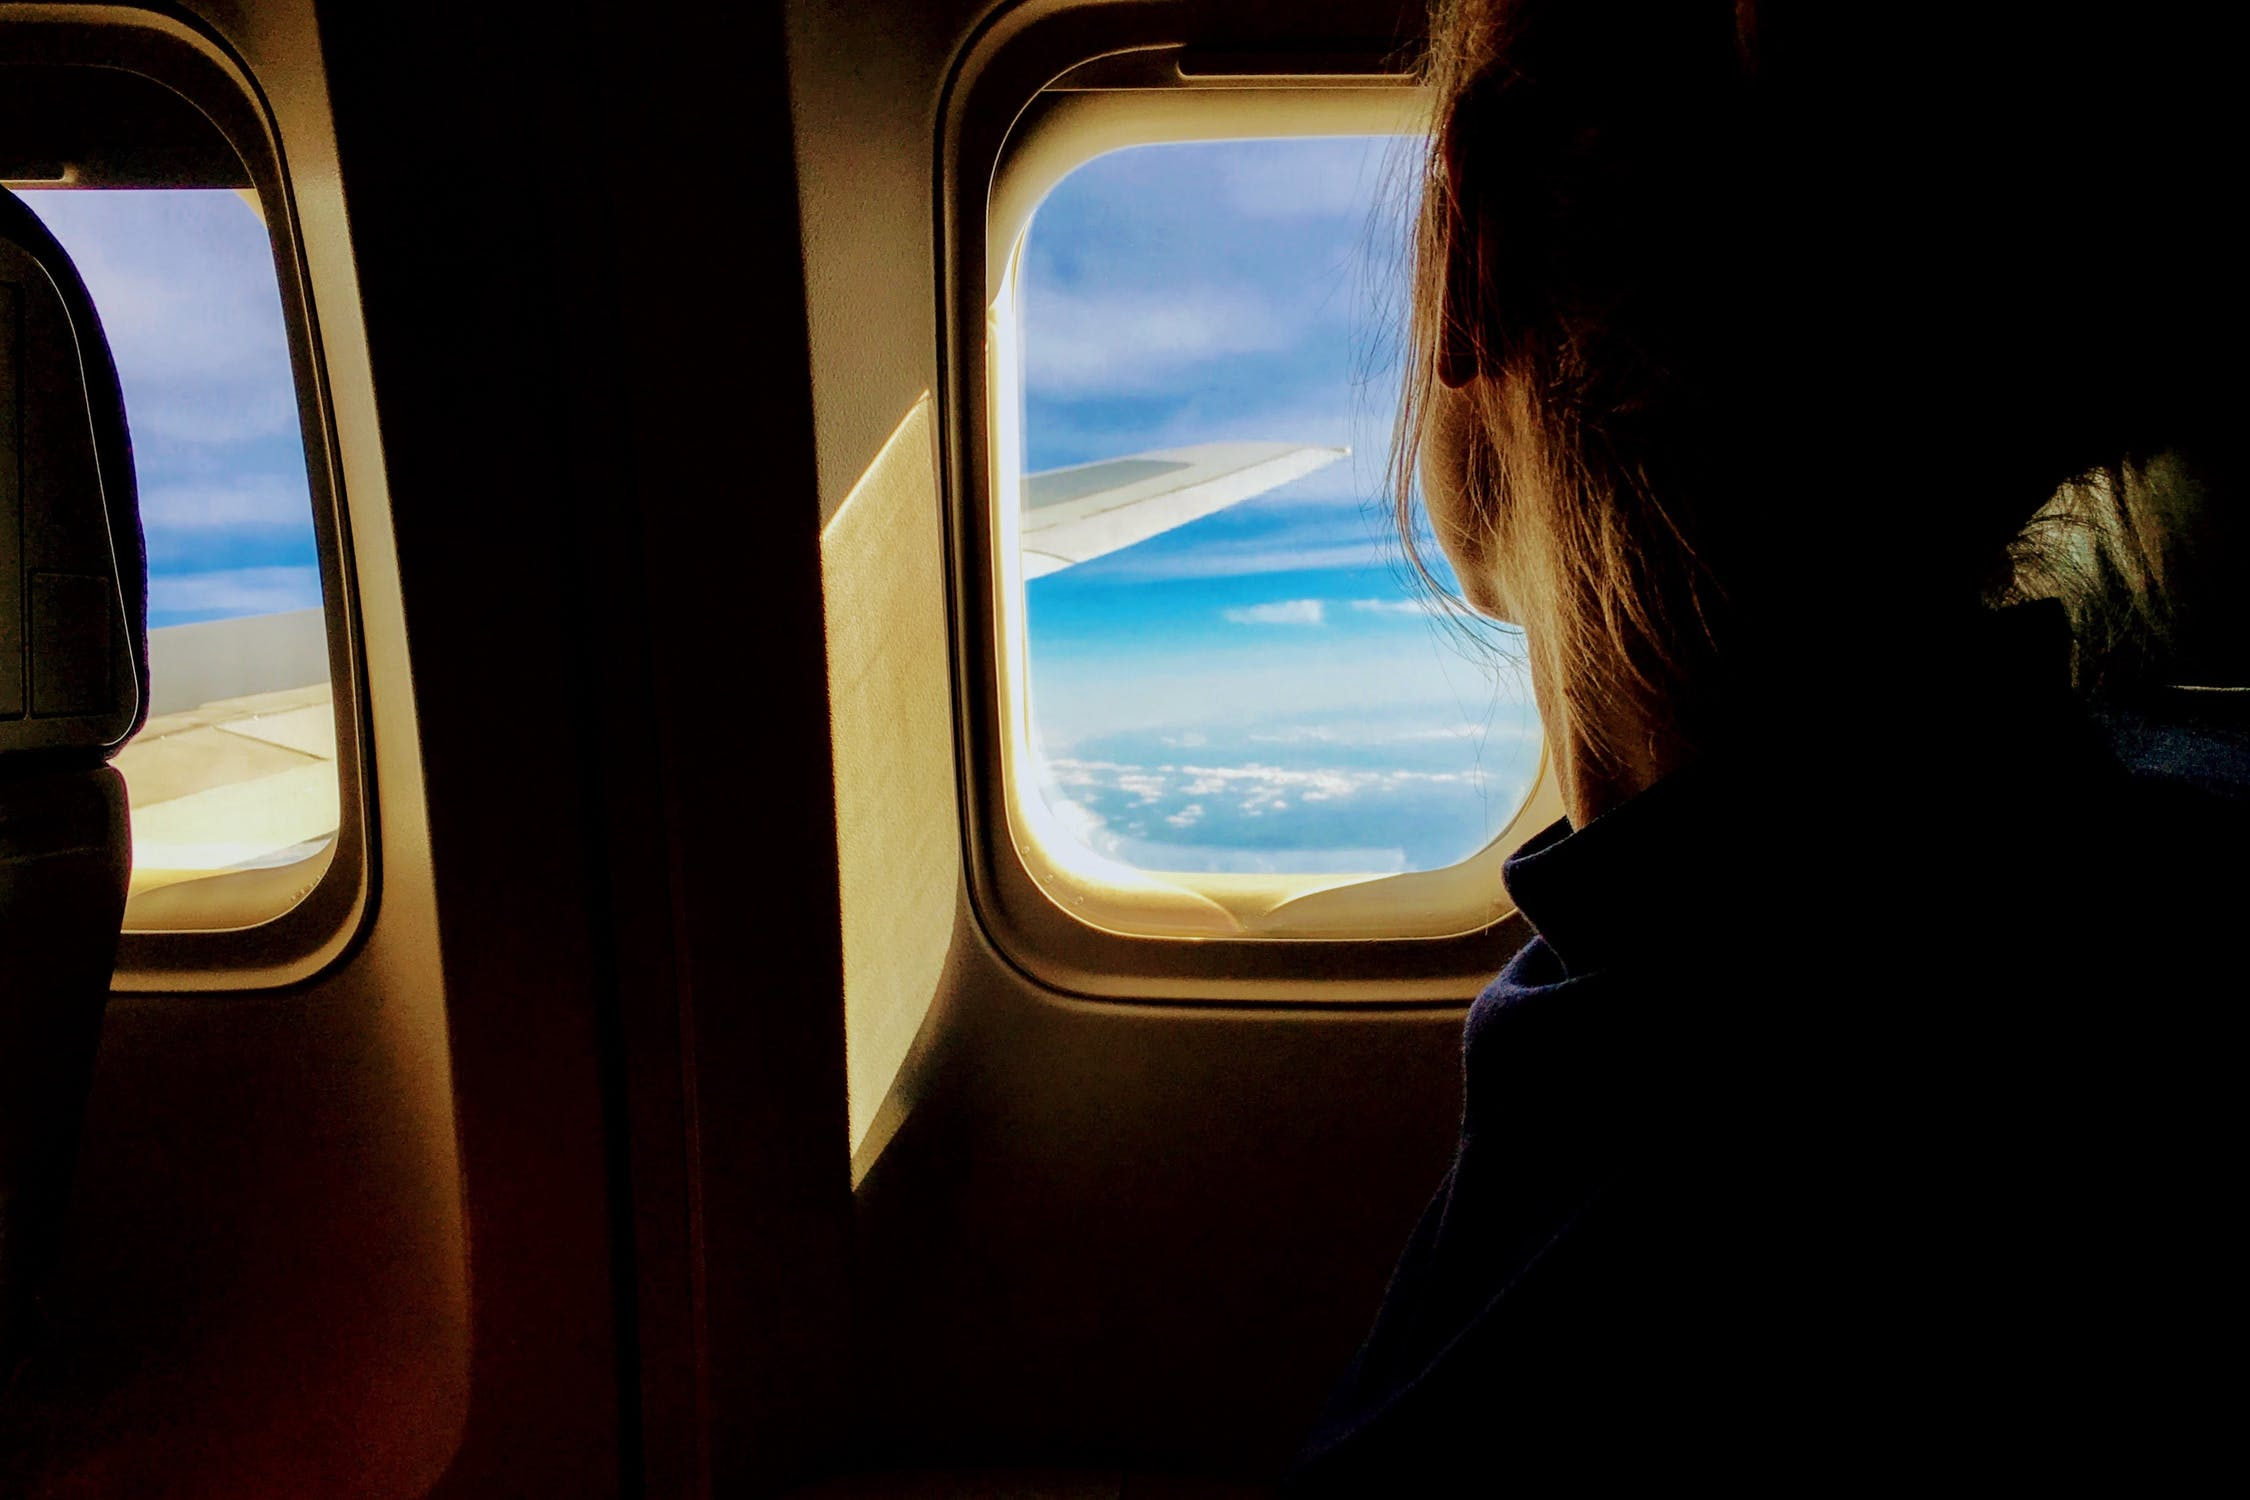 TIPS για να ταξιδέψετε καλύτερα